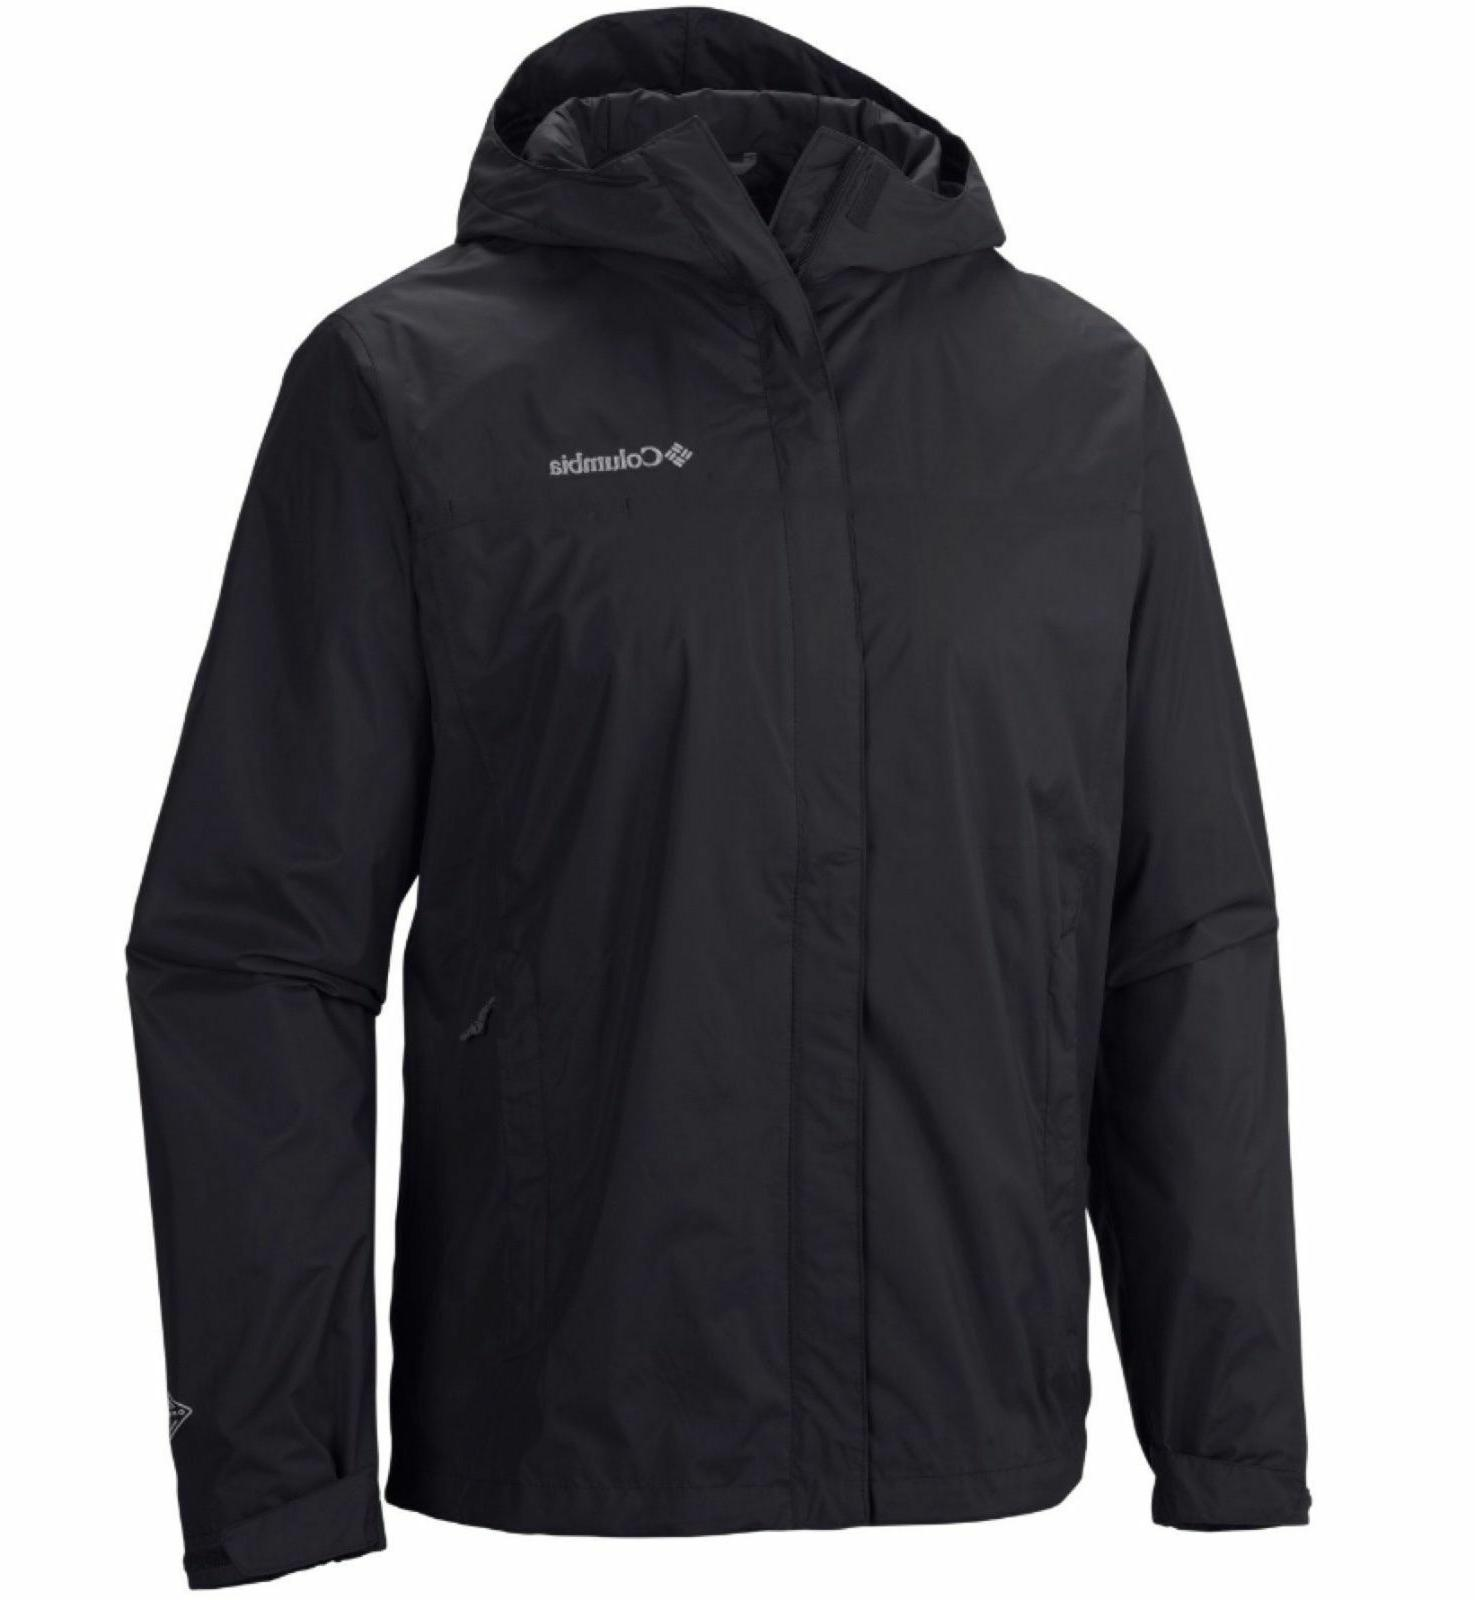 New Columbia Pointe waterproof hooded jacket Tall